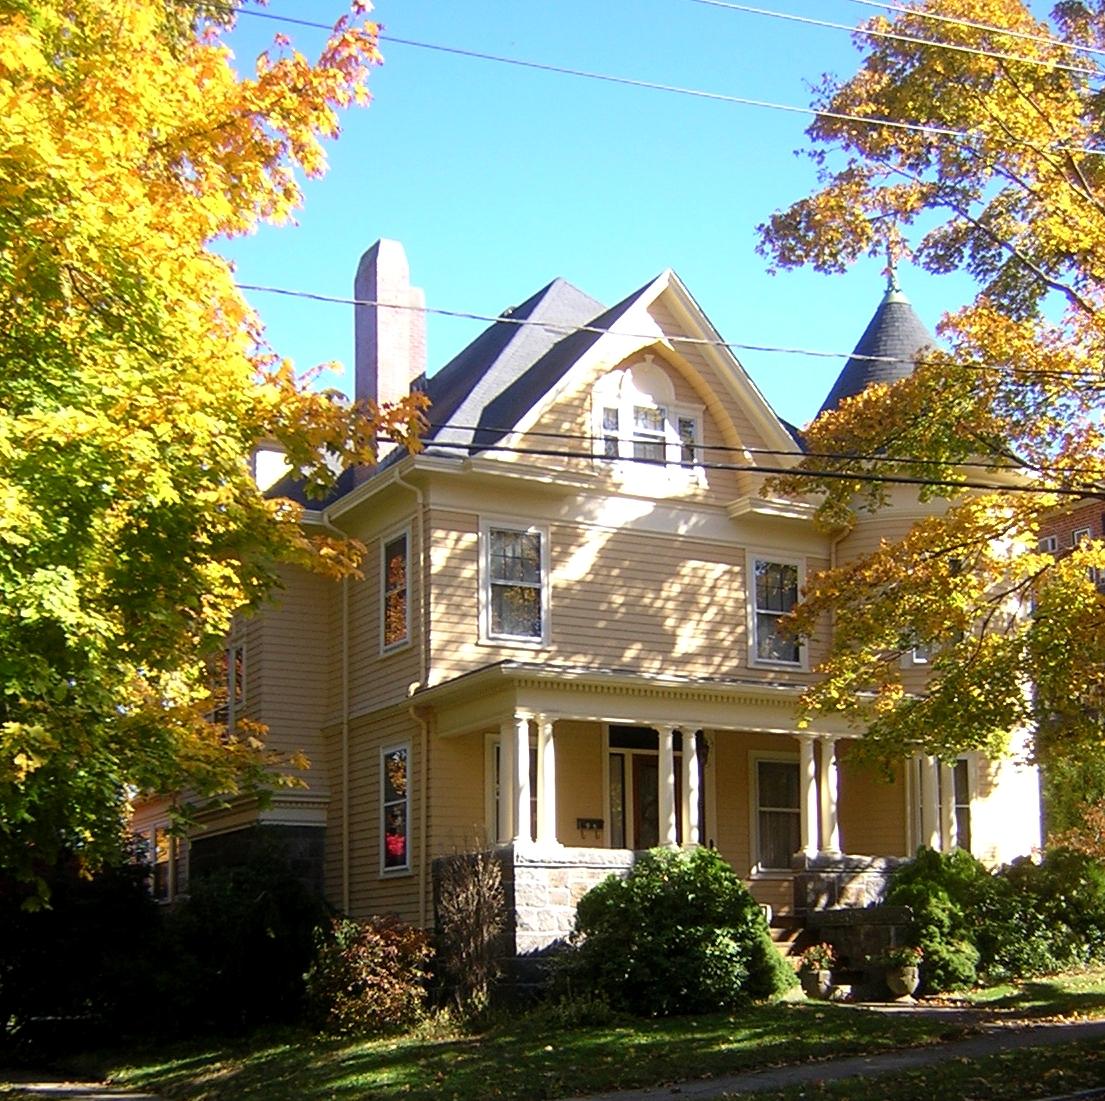 house at 94 grandview avenue wikipedia. Black Bedroom Furniture Sets. Home Design Ideas